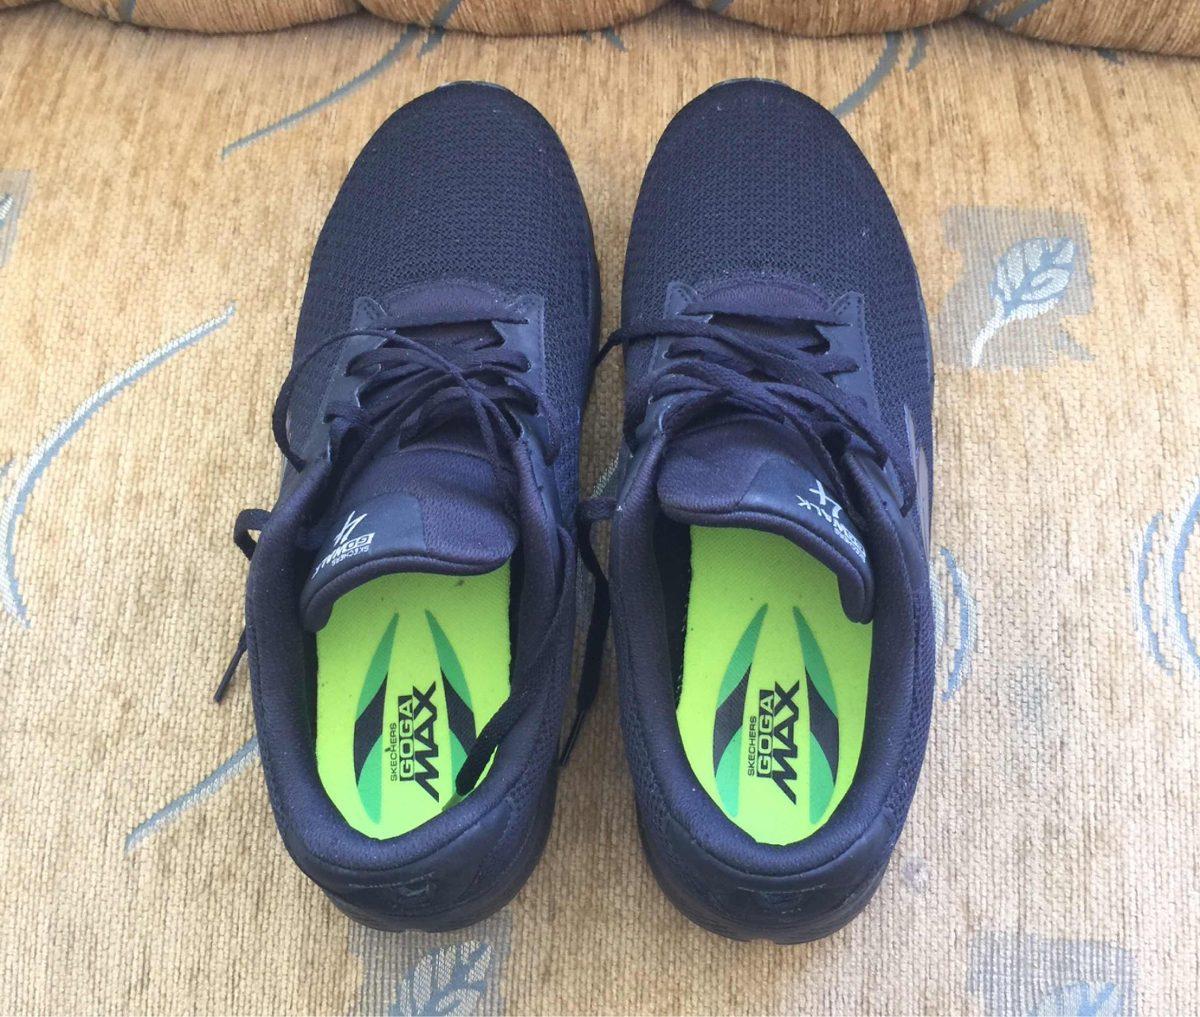 Gowalk Hombre 4 Zapatos Para Skechers hrdBtsQxoC